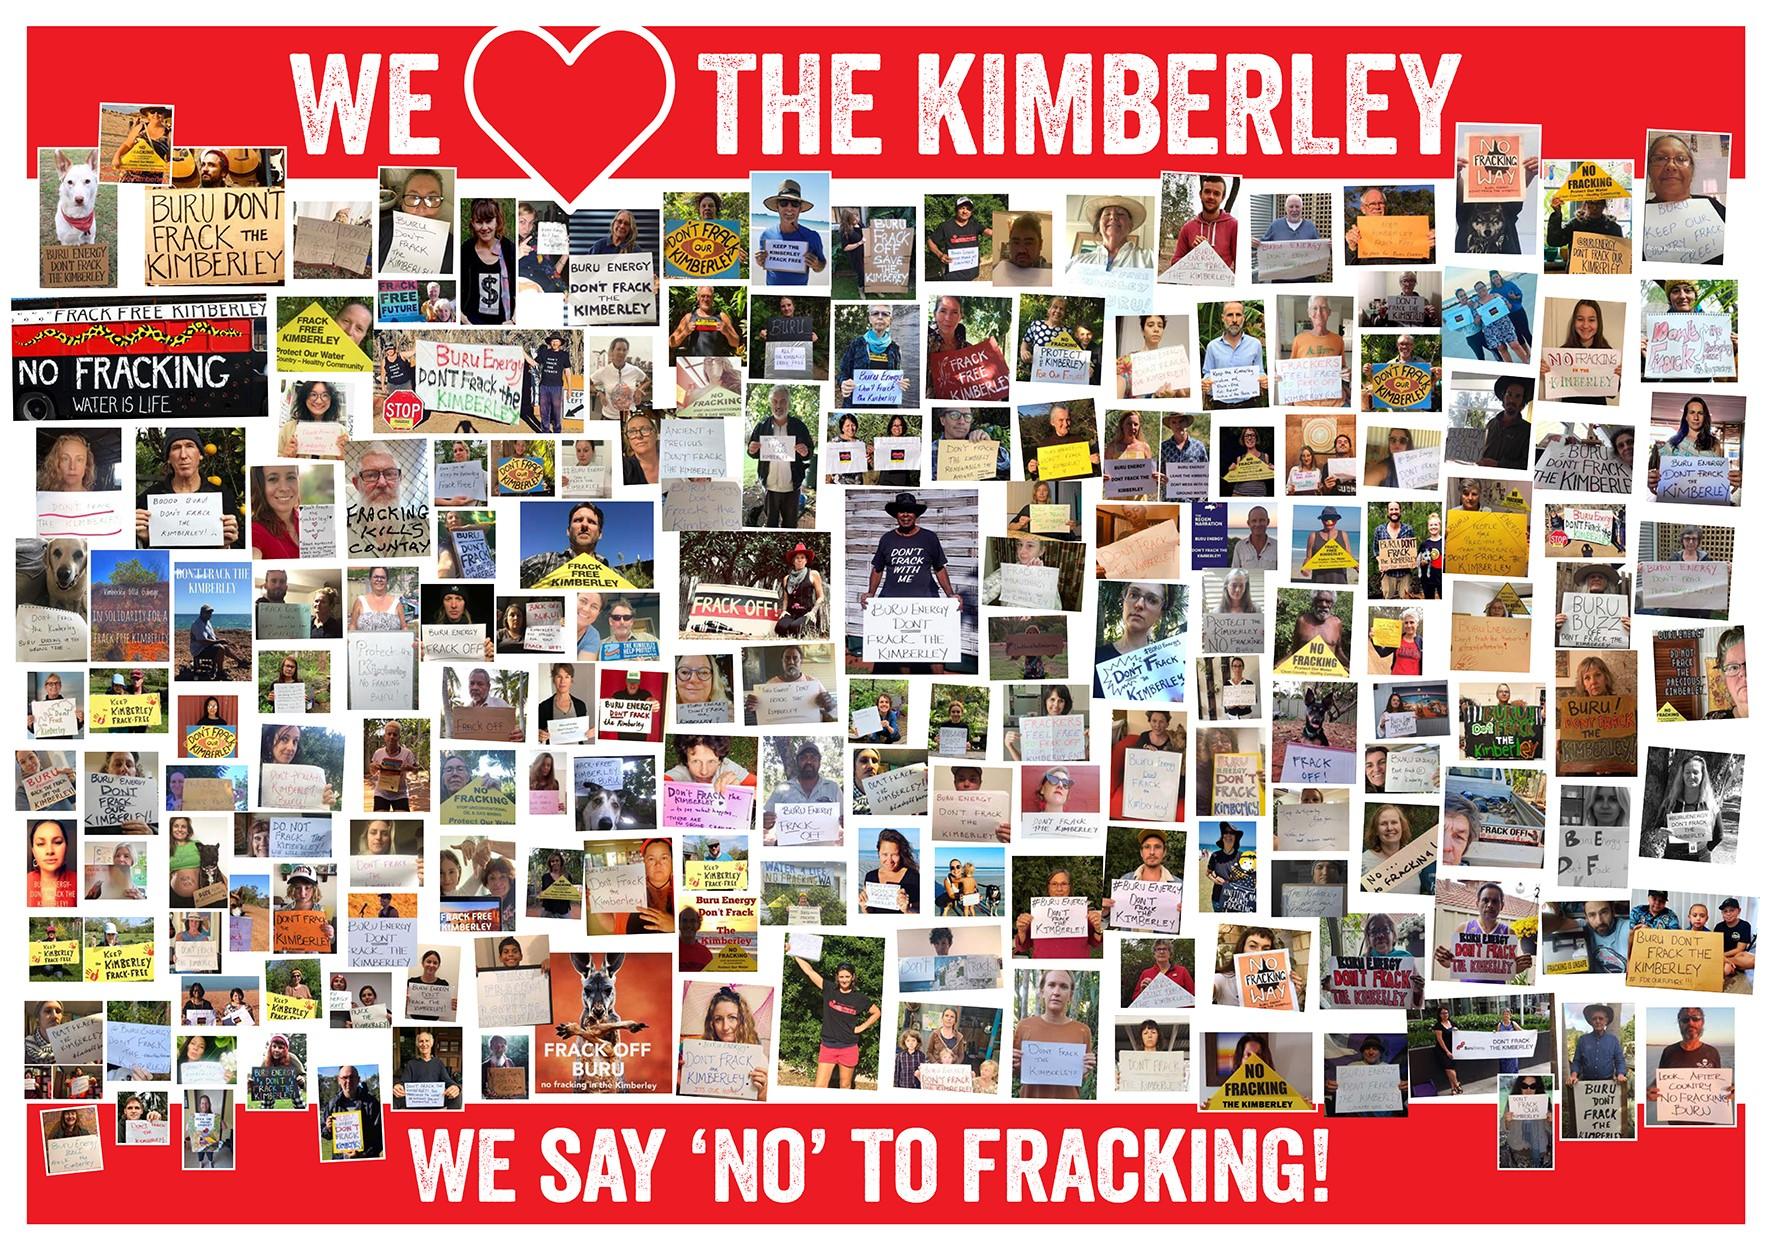 We Love the Kimberley - No Fracking